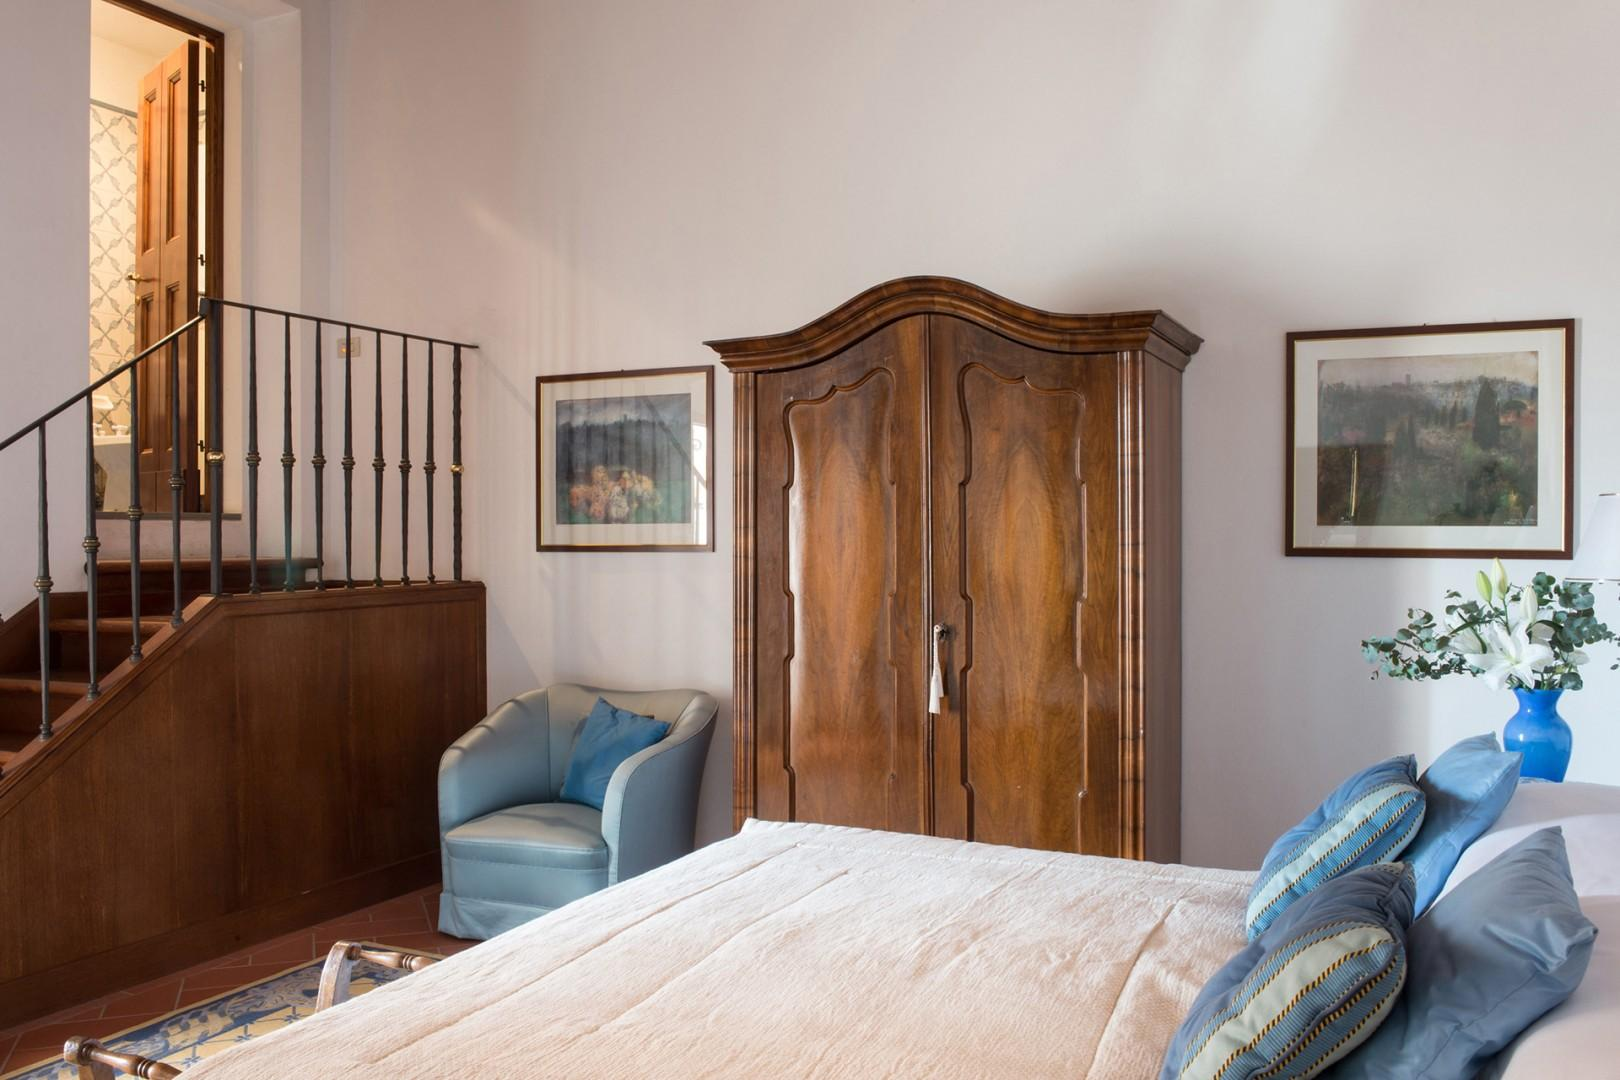 Bedroom 3 with en suite bathroom up the stairs